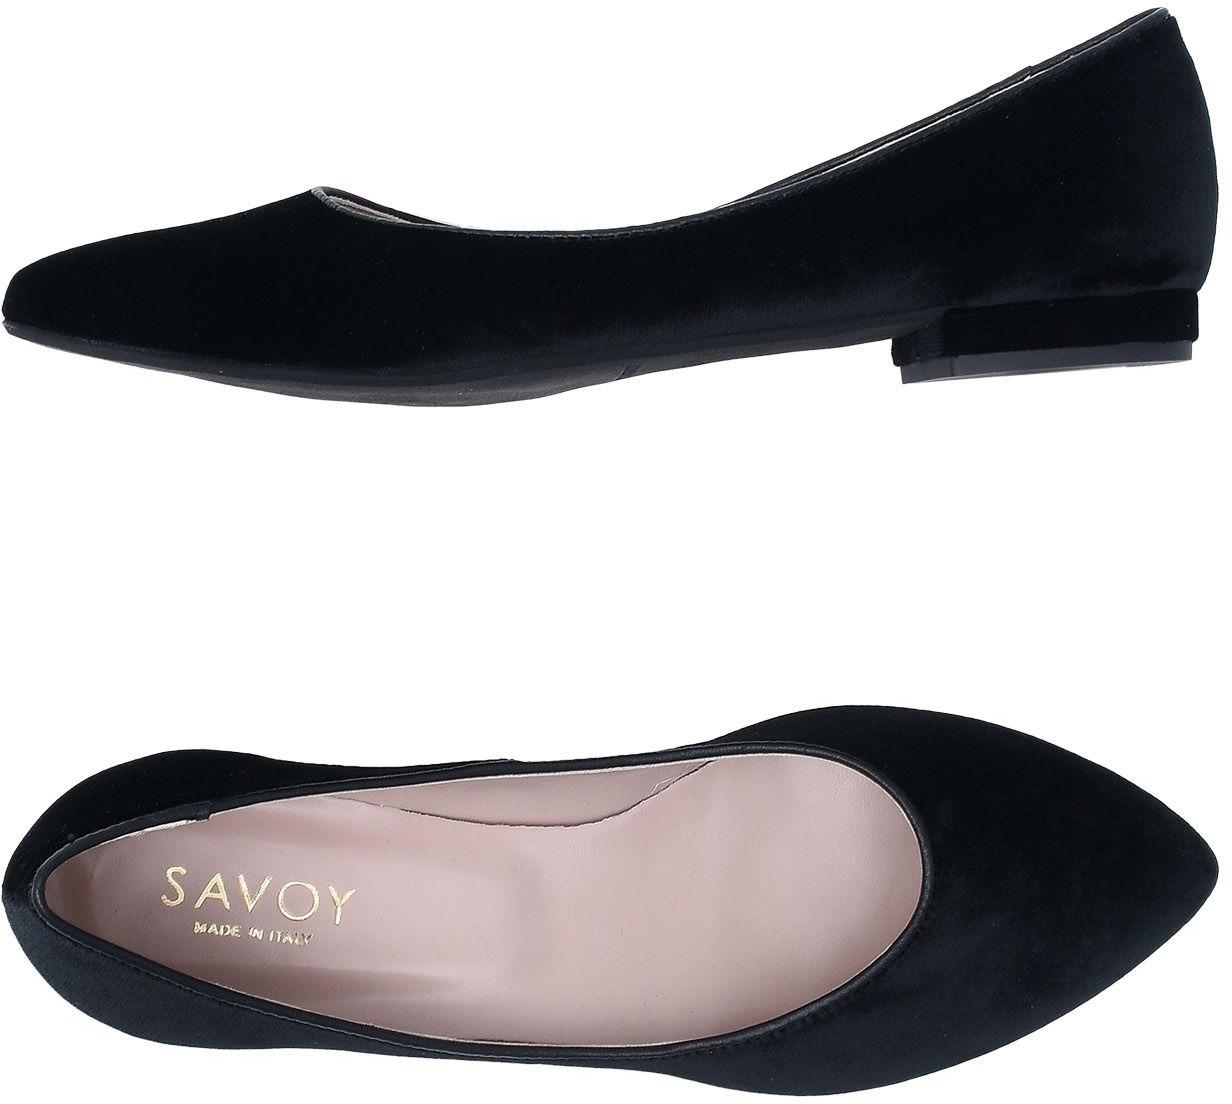 643ddbb6efb6 SAVOY - CALZATURE - Ballerine -   Bantoa